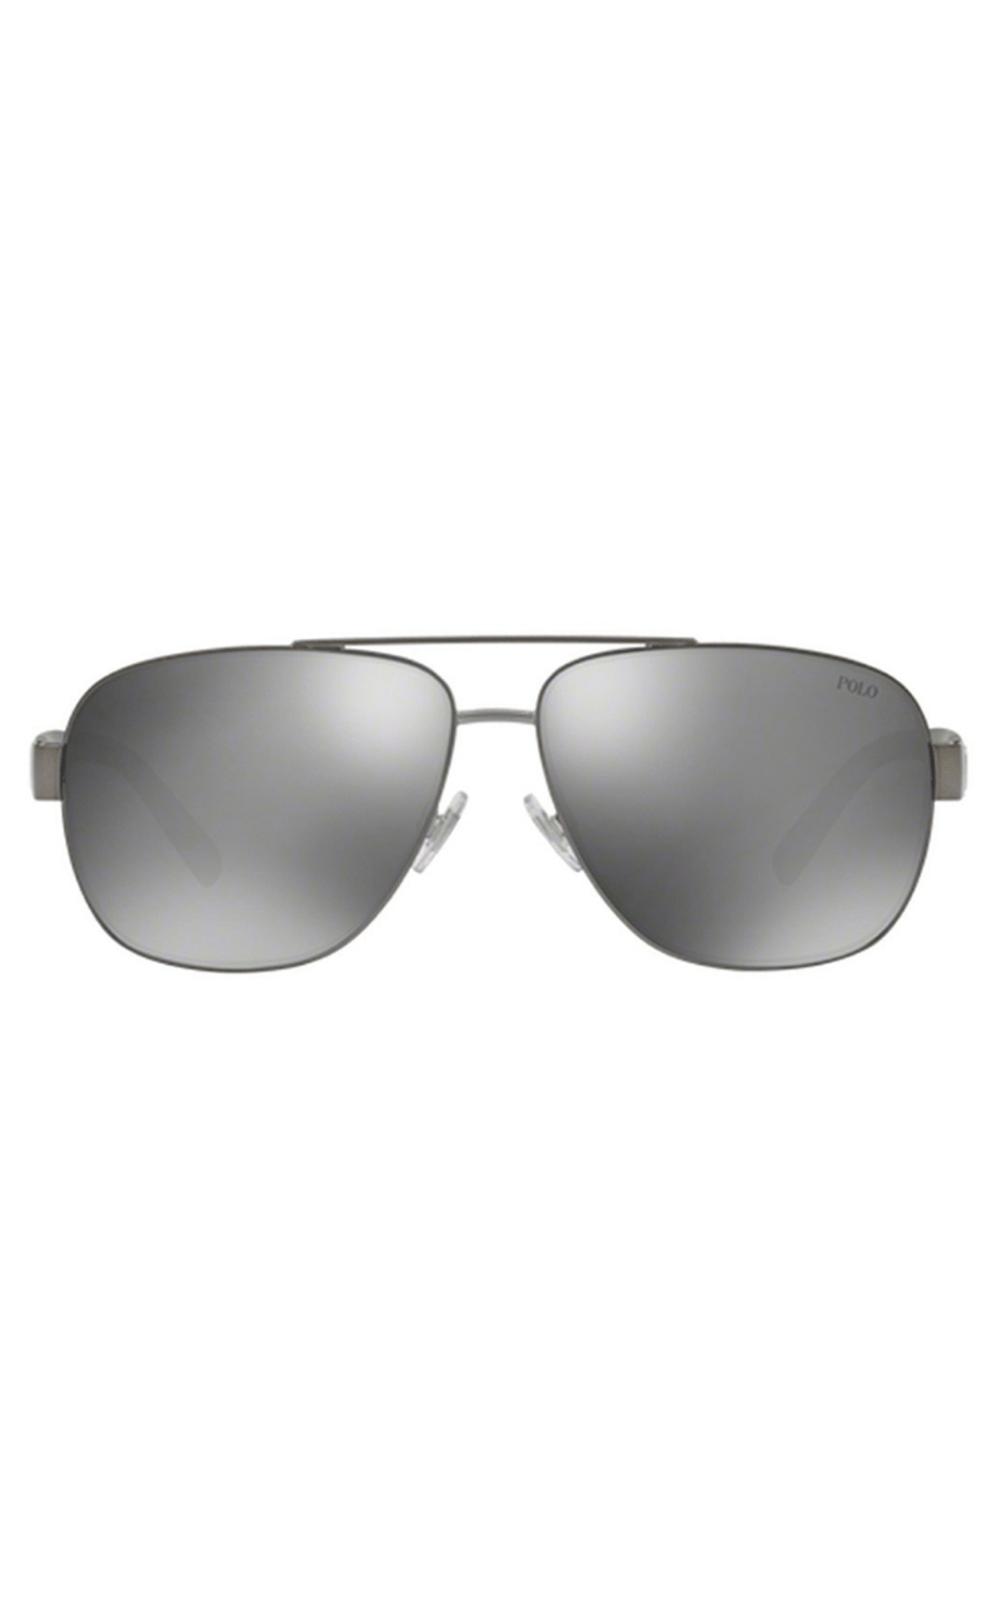 Foto 2 - Óculos De Sol Polo Ralph Lauren 3110 9157/6G